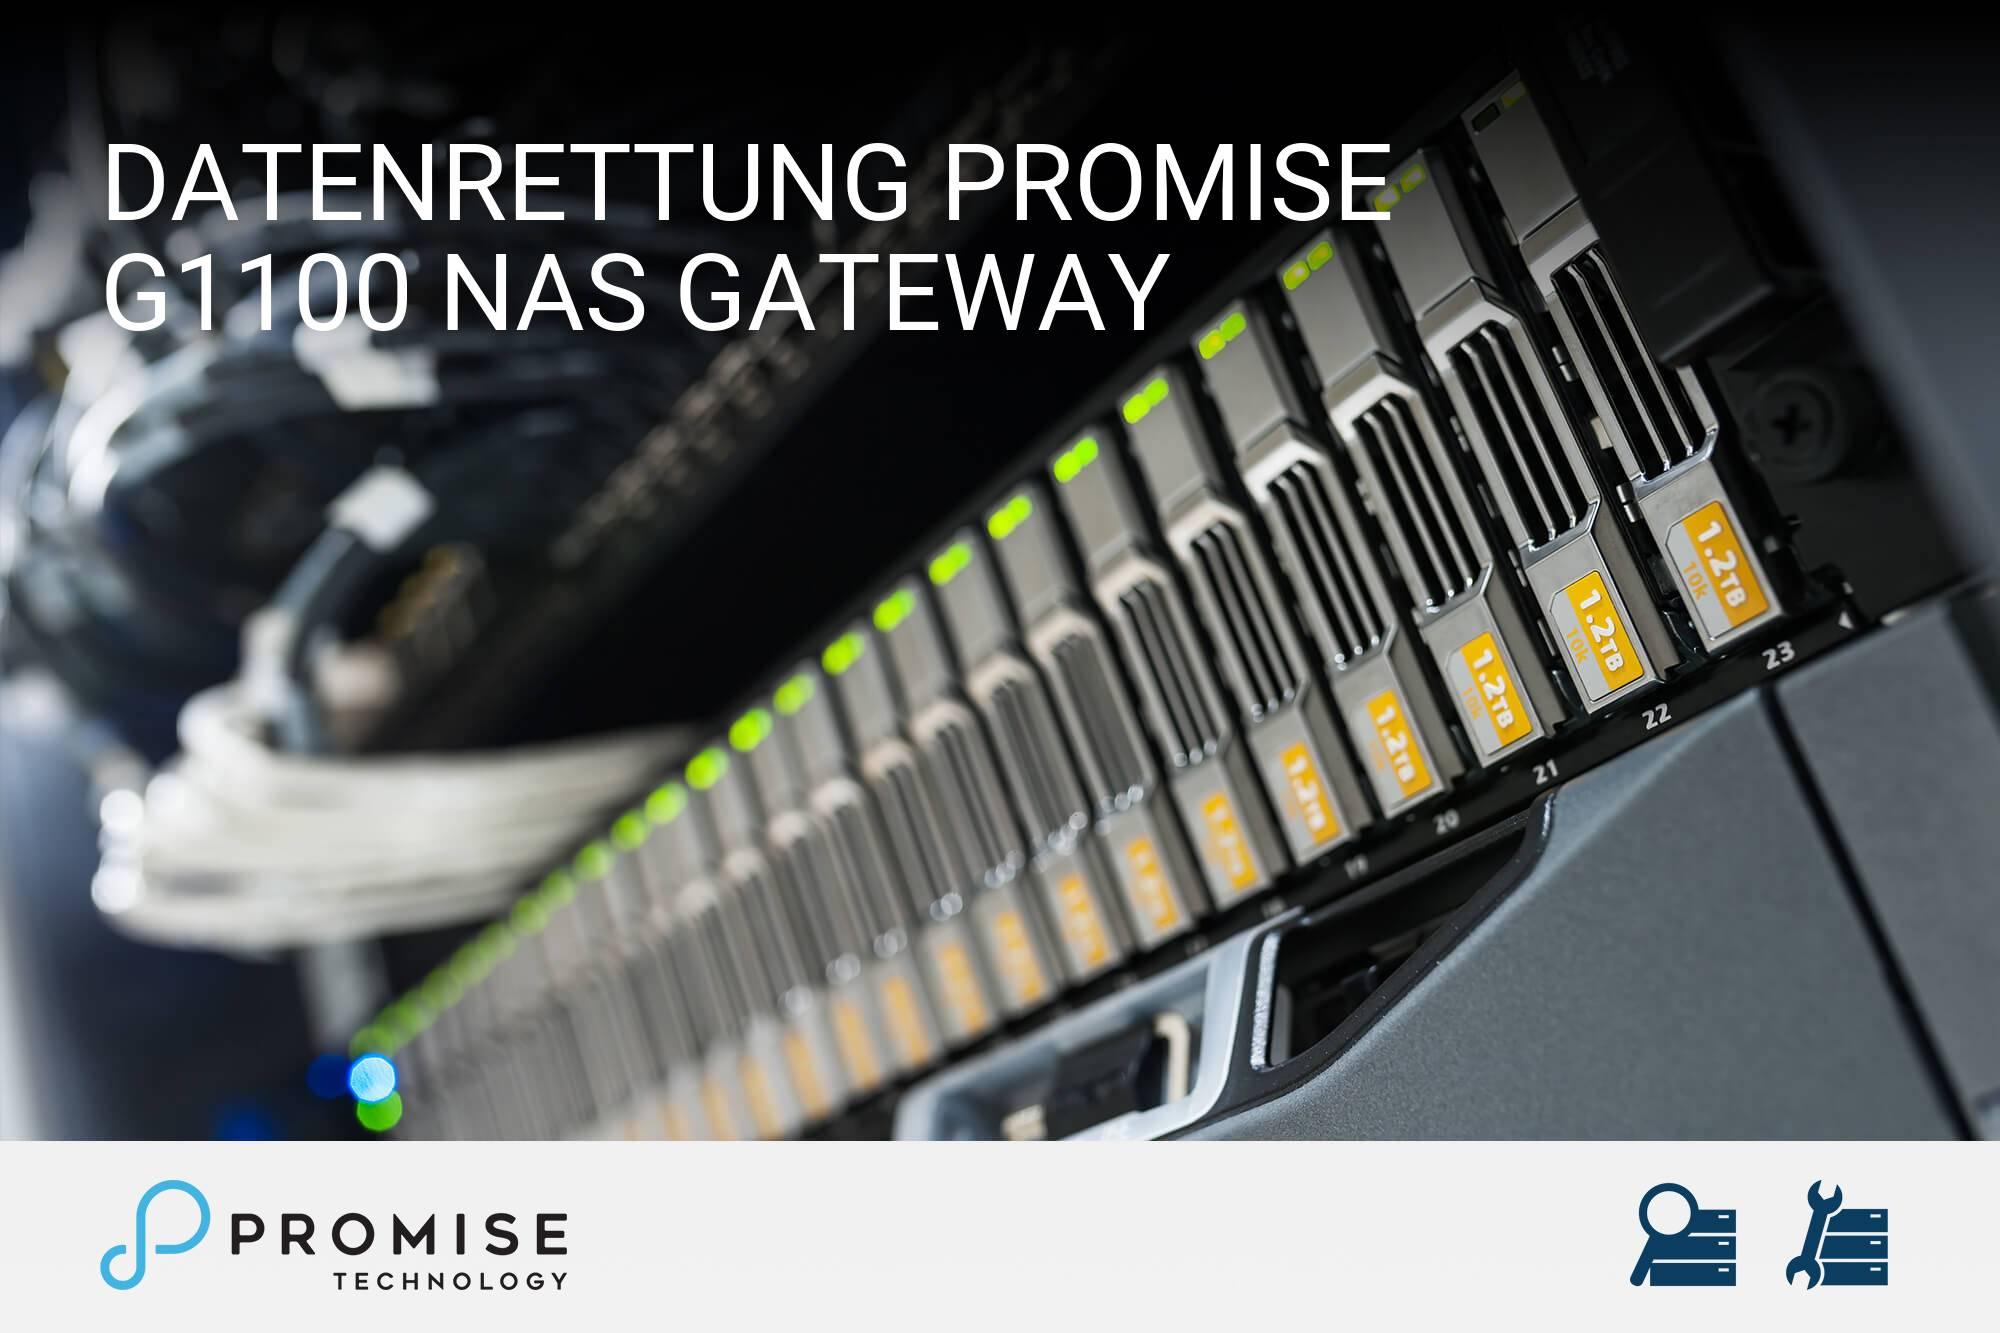 Promise G1100 NAS Gateway